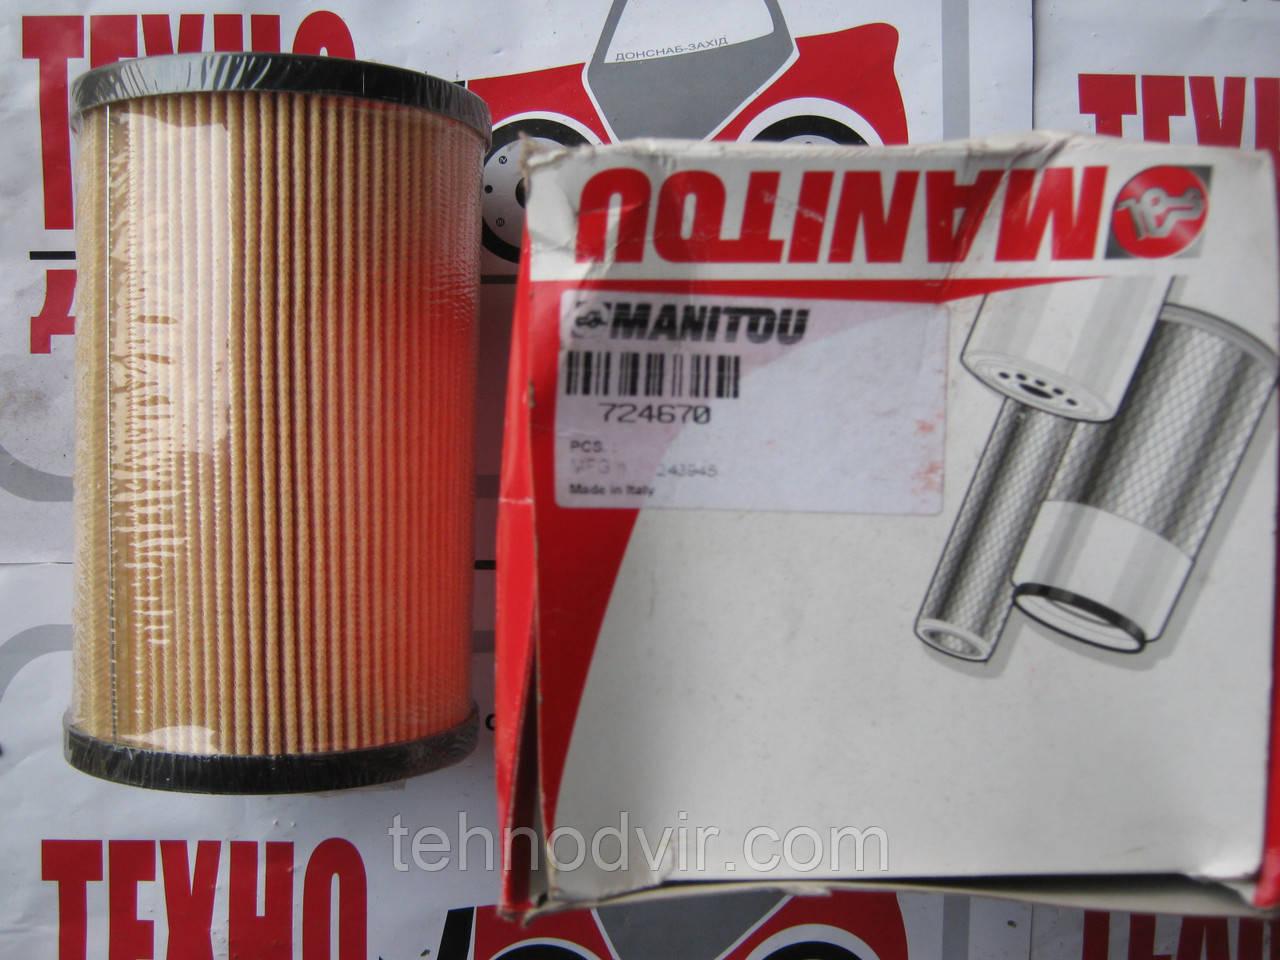 724670 - Елемент фільтра гідравлічного . Manitou